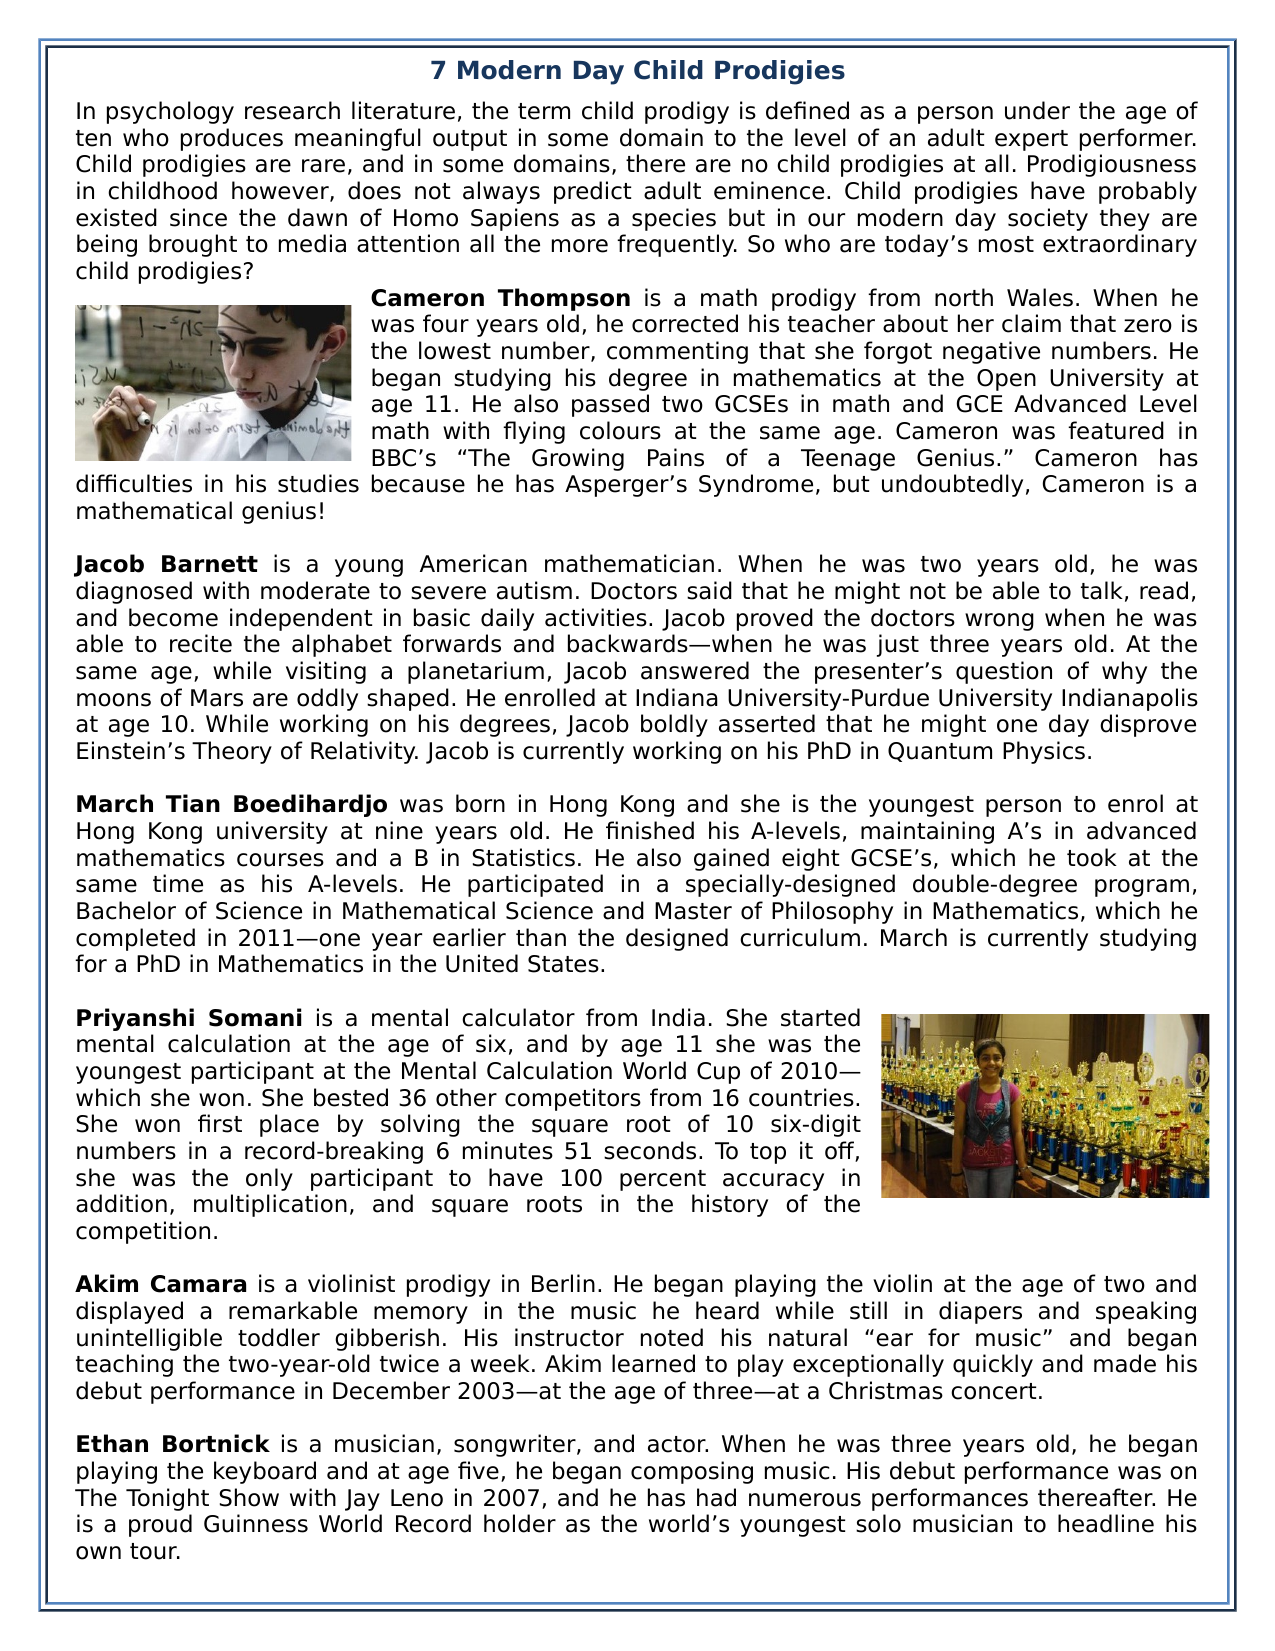 7 Modern Day Child Prodigies Reading Comprehension Worksheet Text Teaching Resources Comprehension Worksheets Reading Comprehension Reading Comprehension Worksheets [ 1651 x 1275 Pixel ]